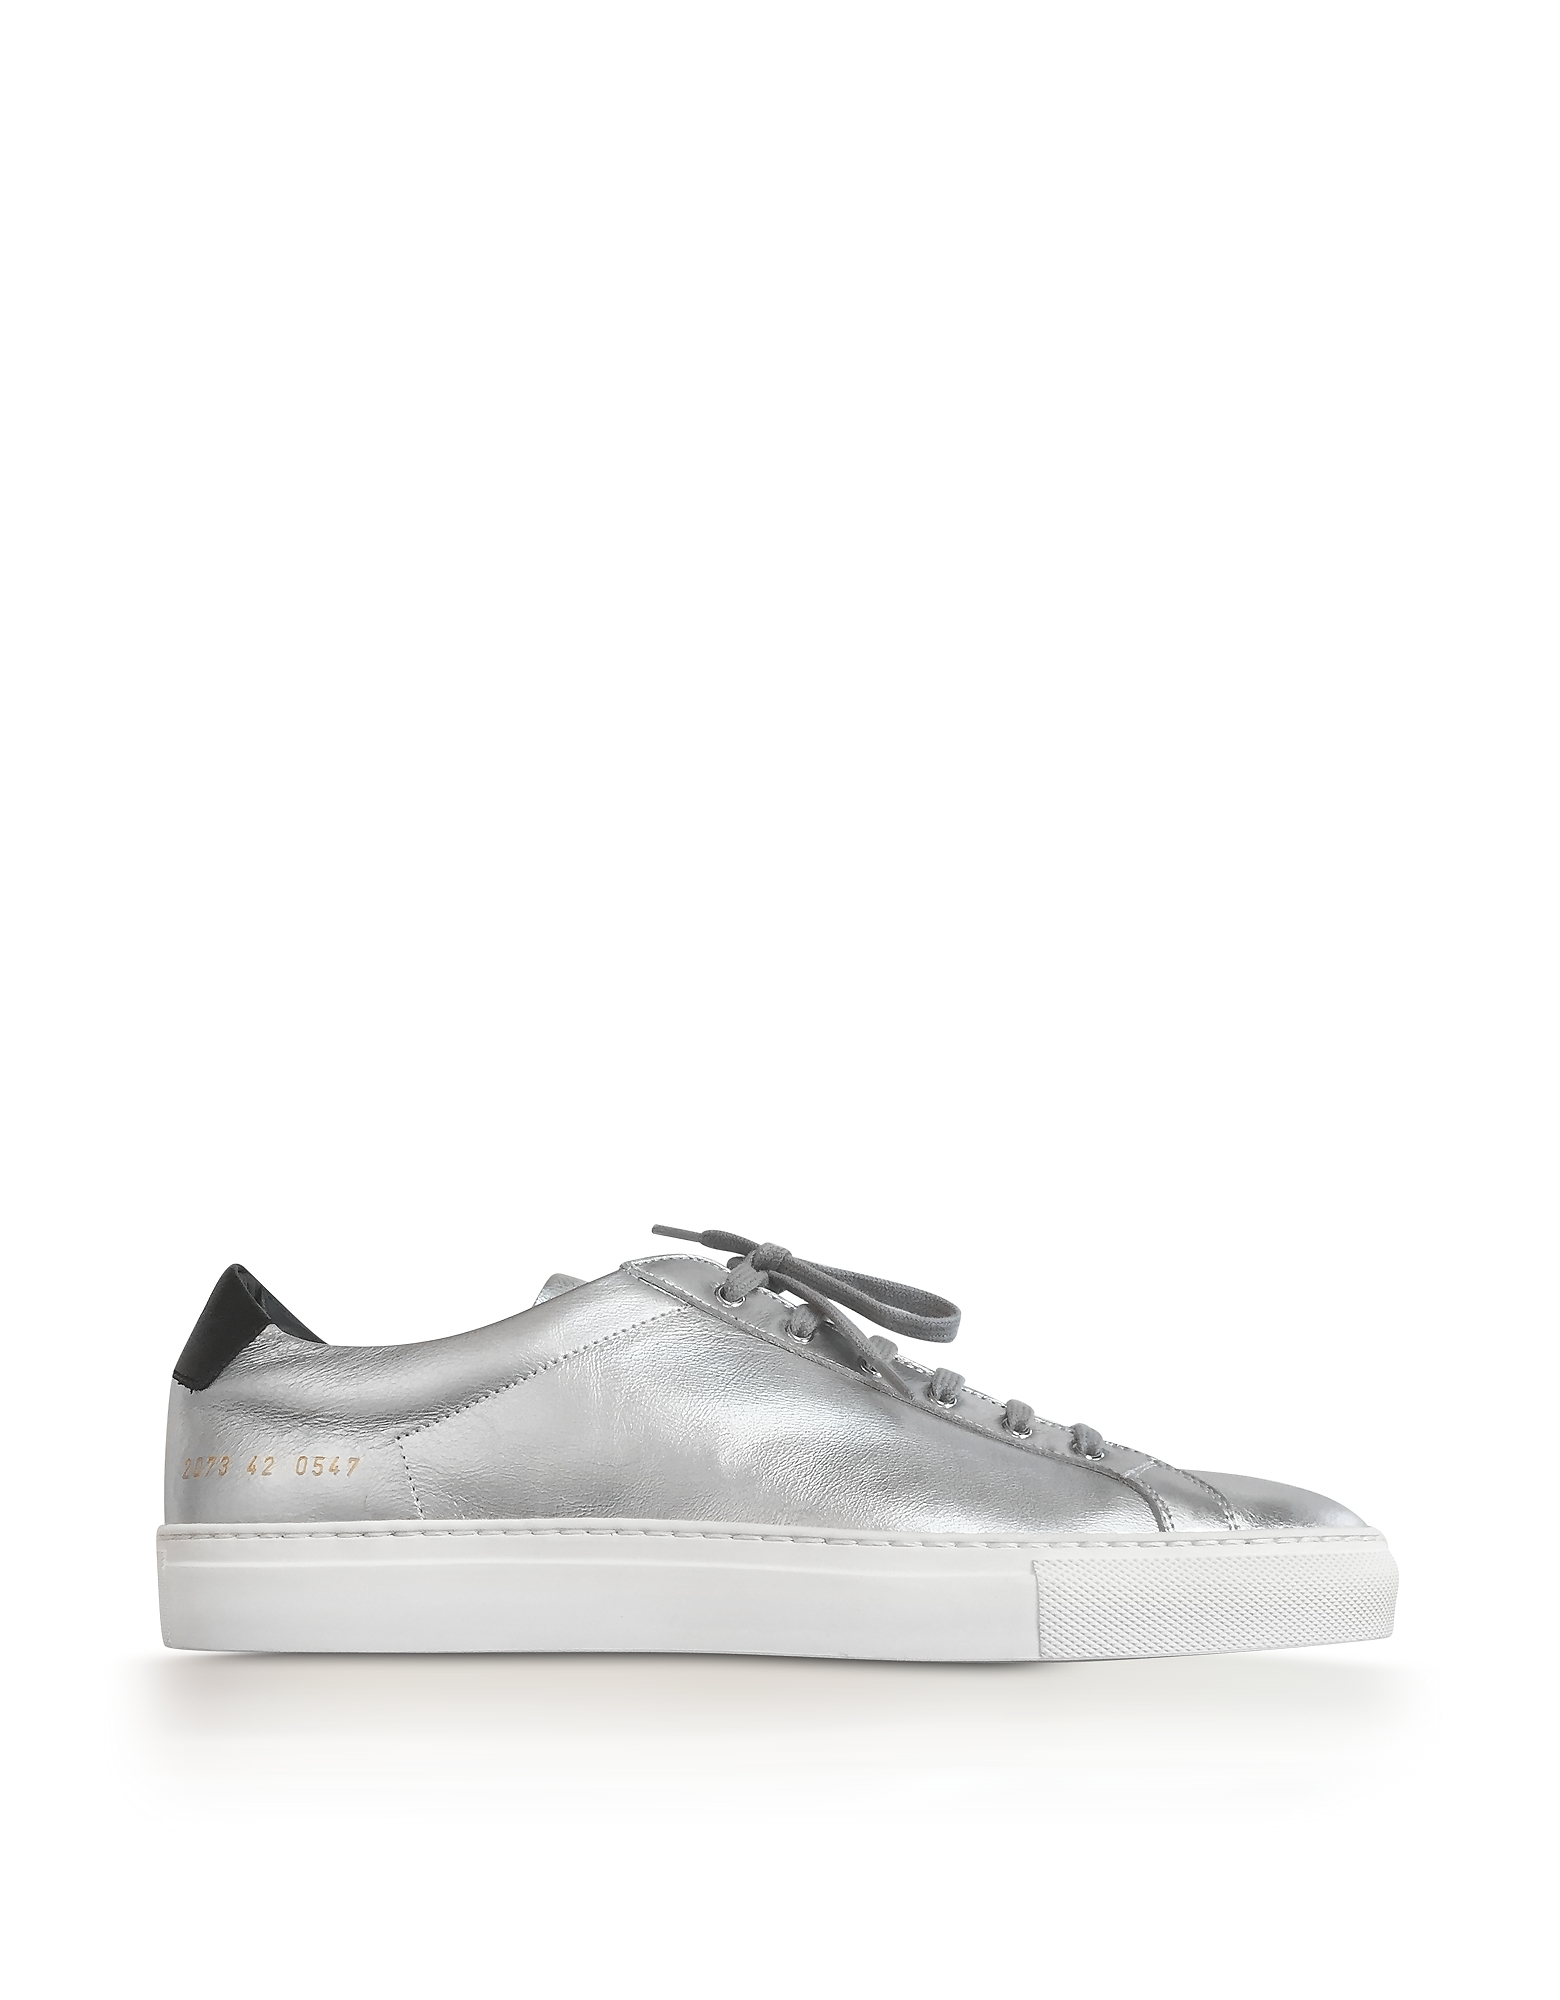 Common Projects Shoes, Achilles Retro Low Silver Leather Men's Sneaker